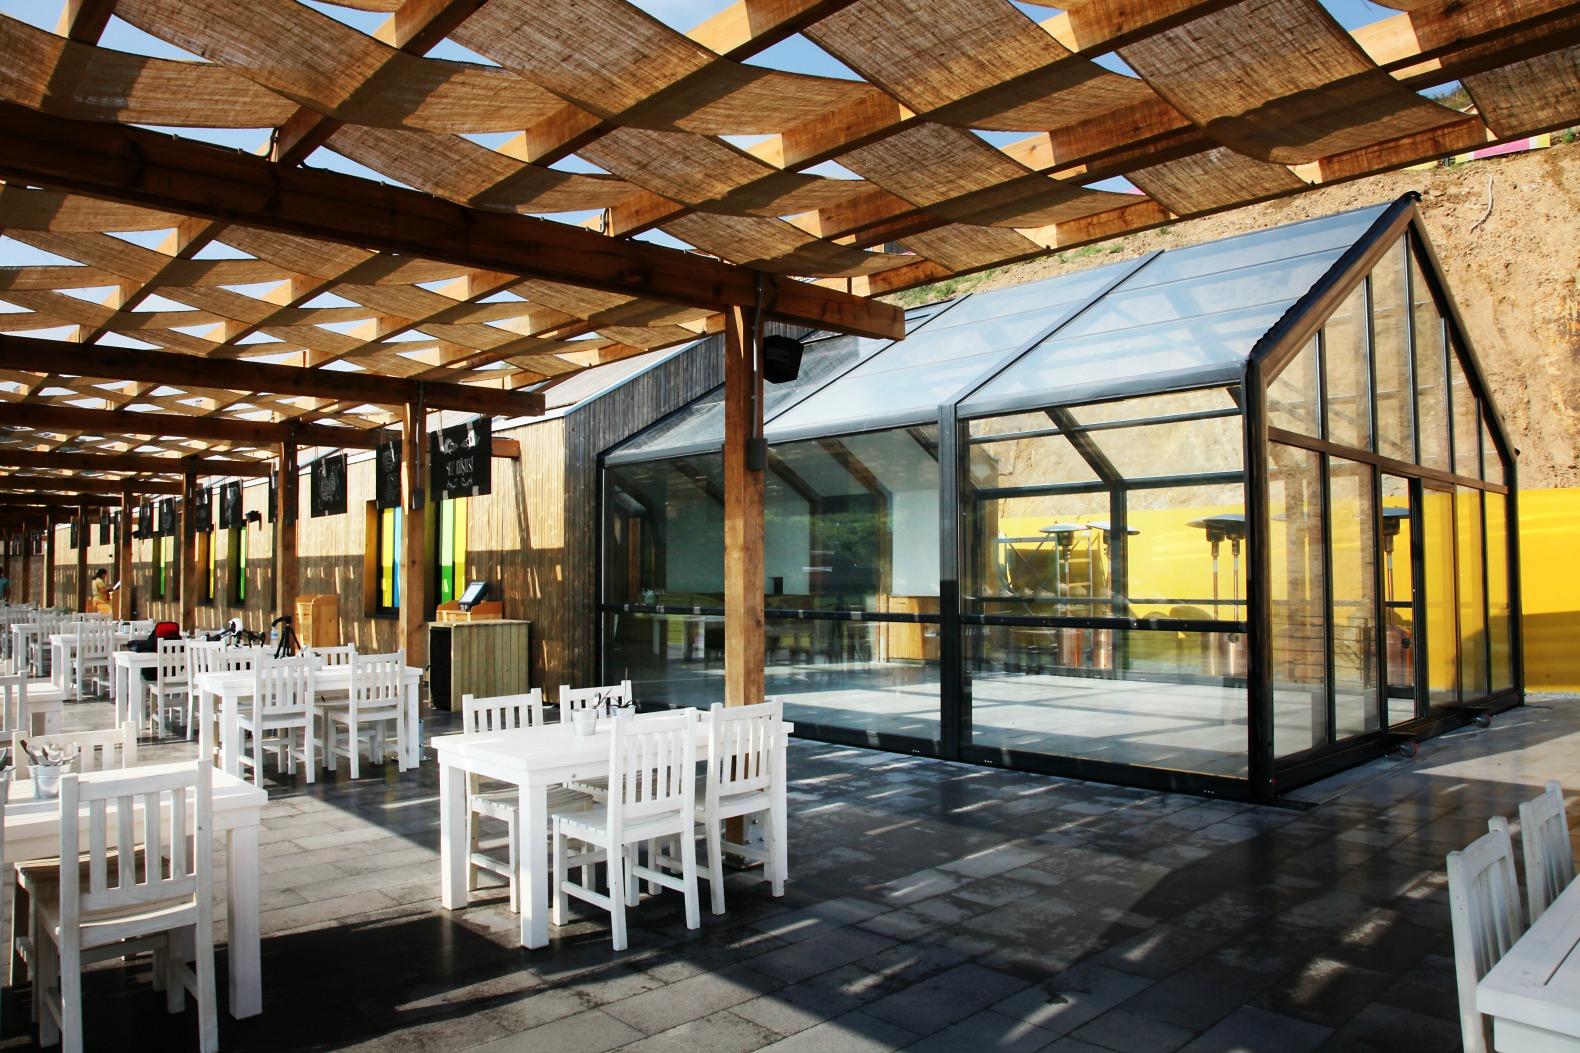 Retractable restaurant addition provides flexible space